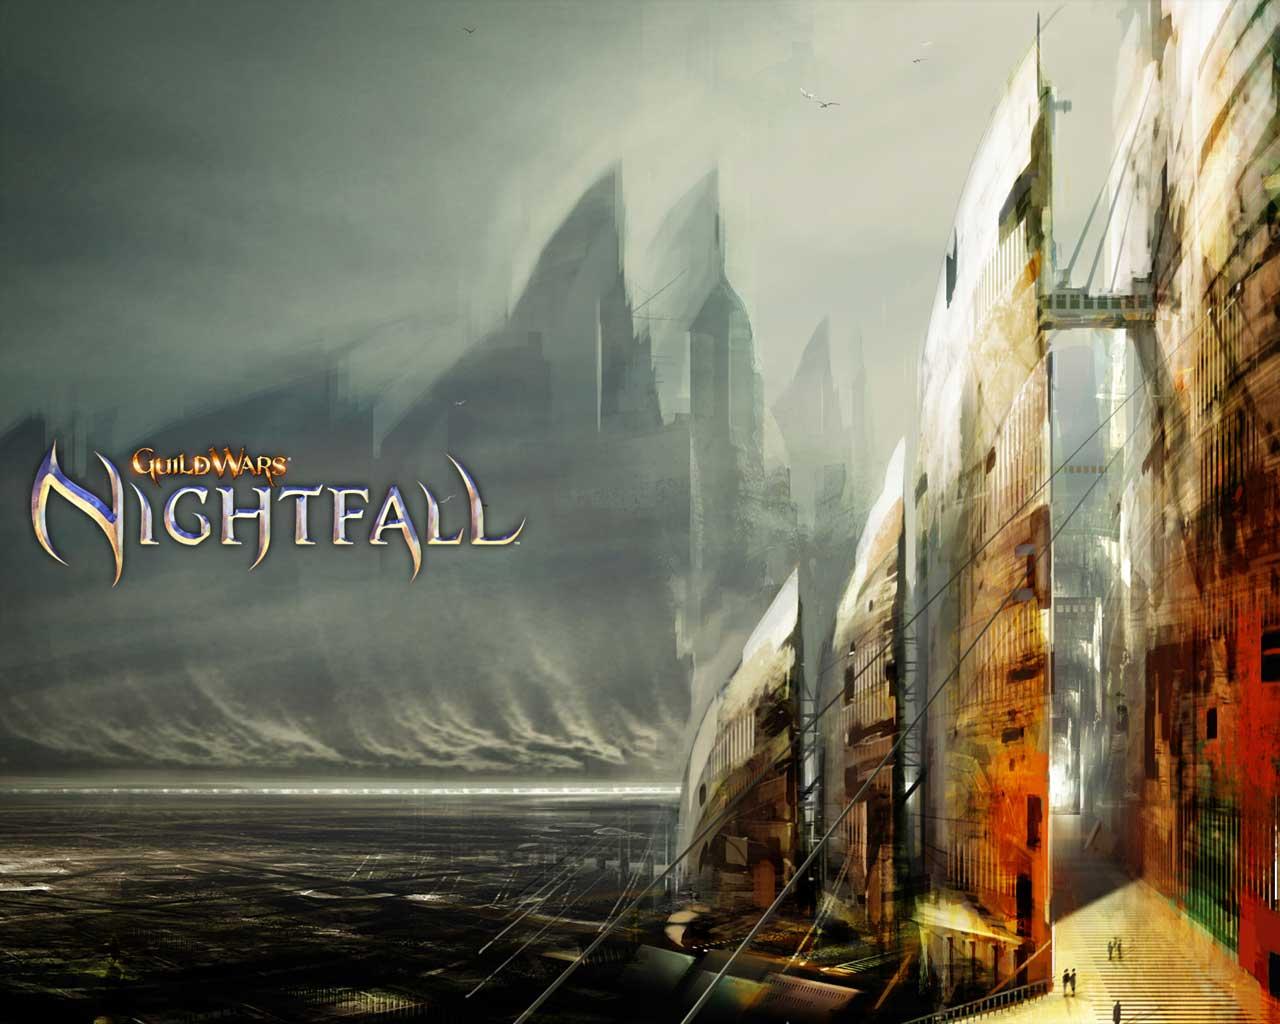 Guild Wars Nightfall 1